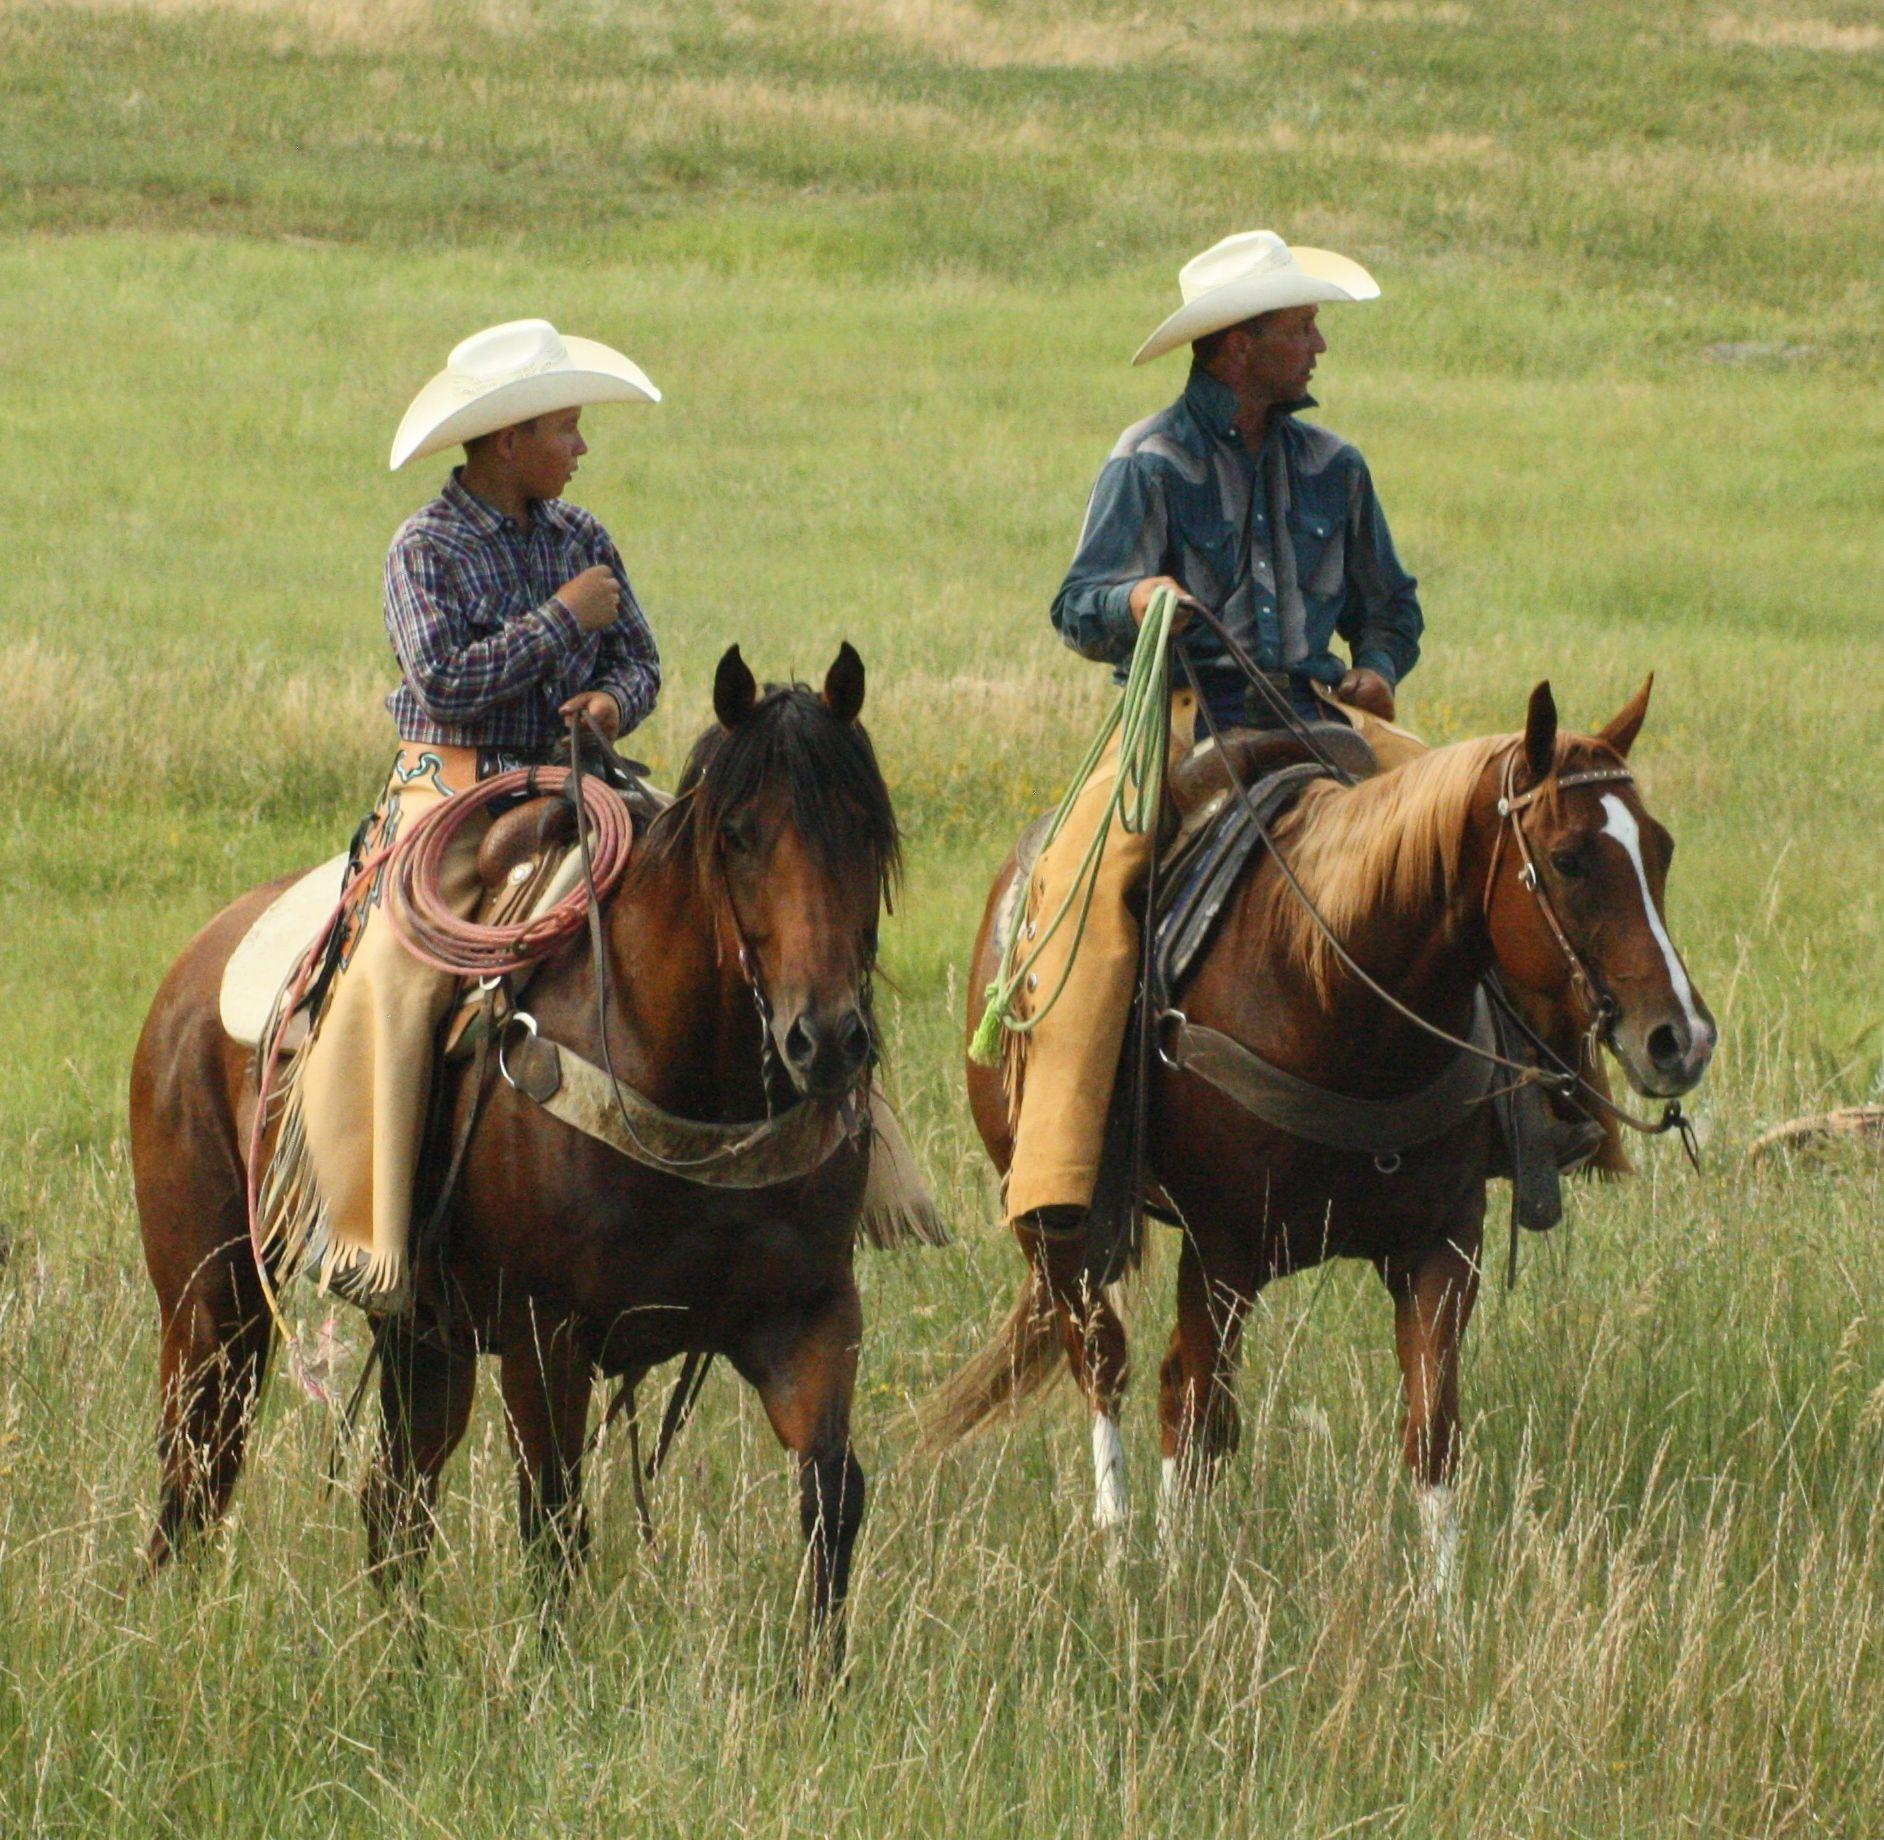 Full House Elite Performance Stock Horse Sale - June 20 - 21, 2014 in Newcastle, Wyoming